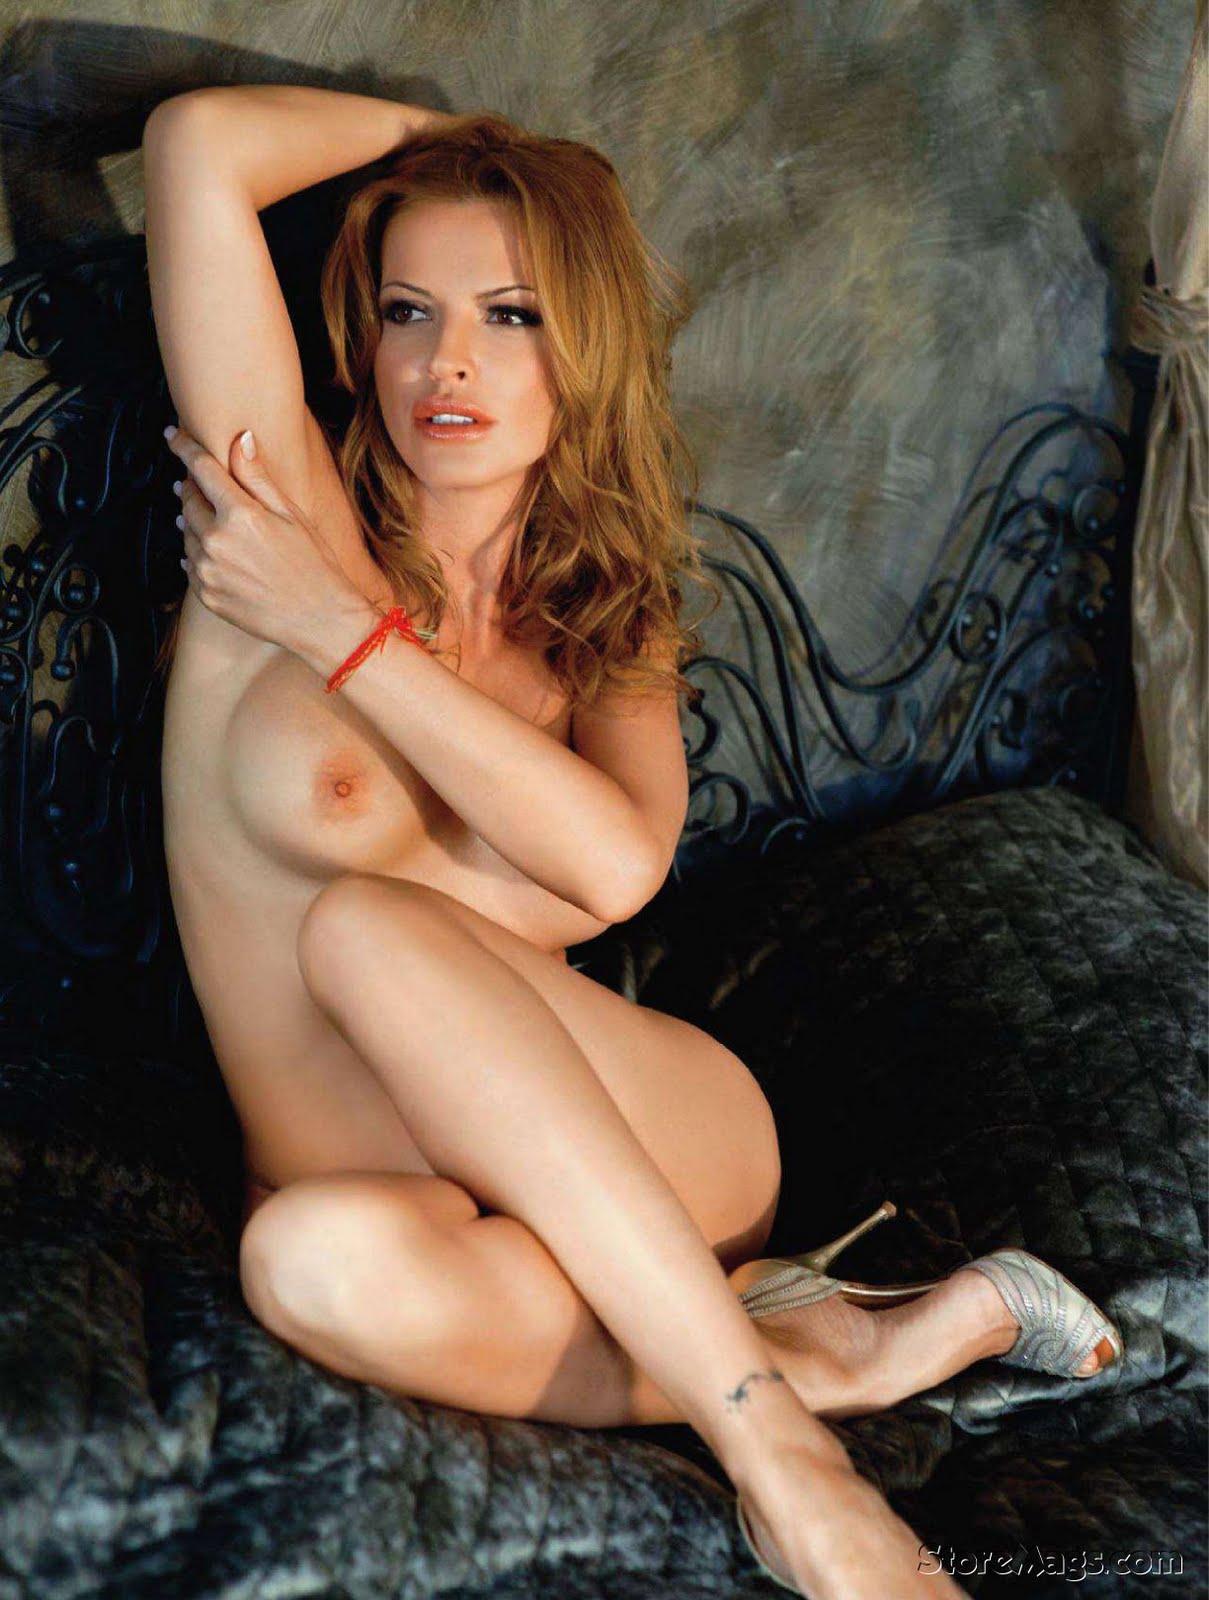 sumskaya-olga-foto-porno-erotika